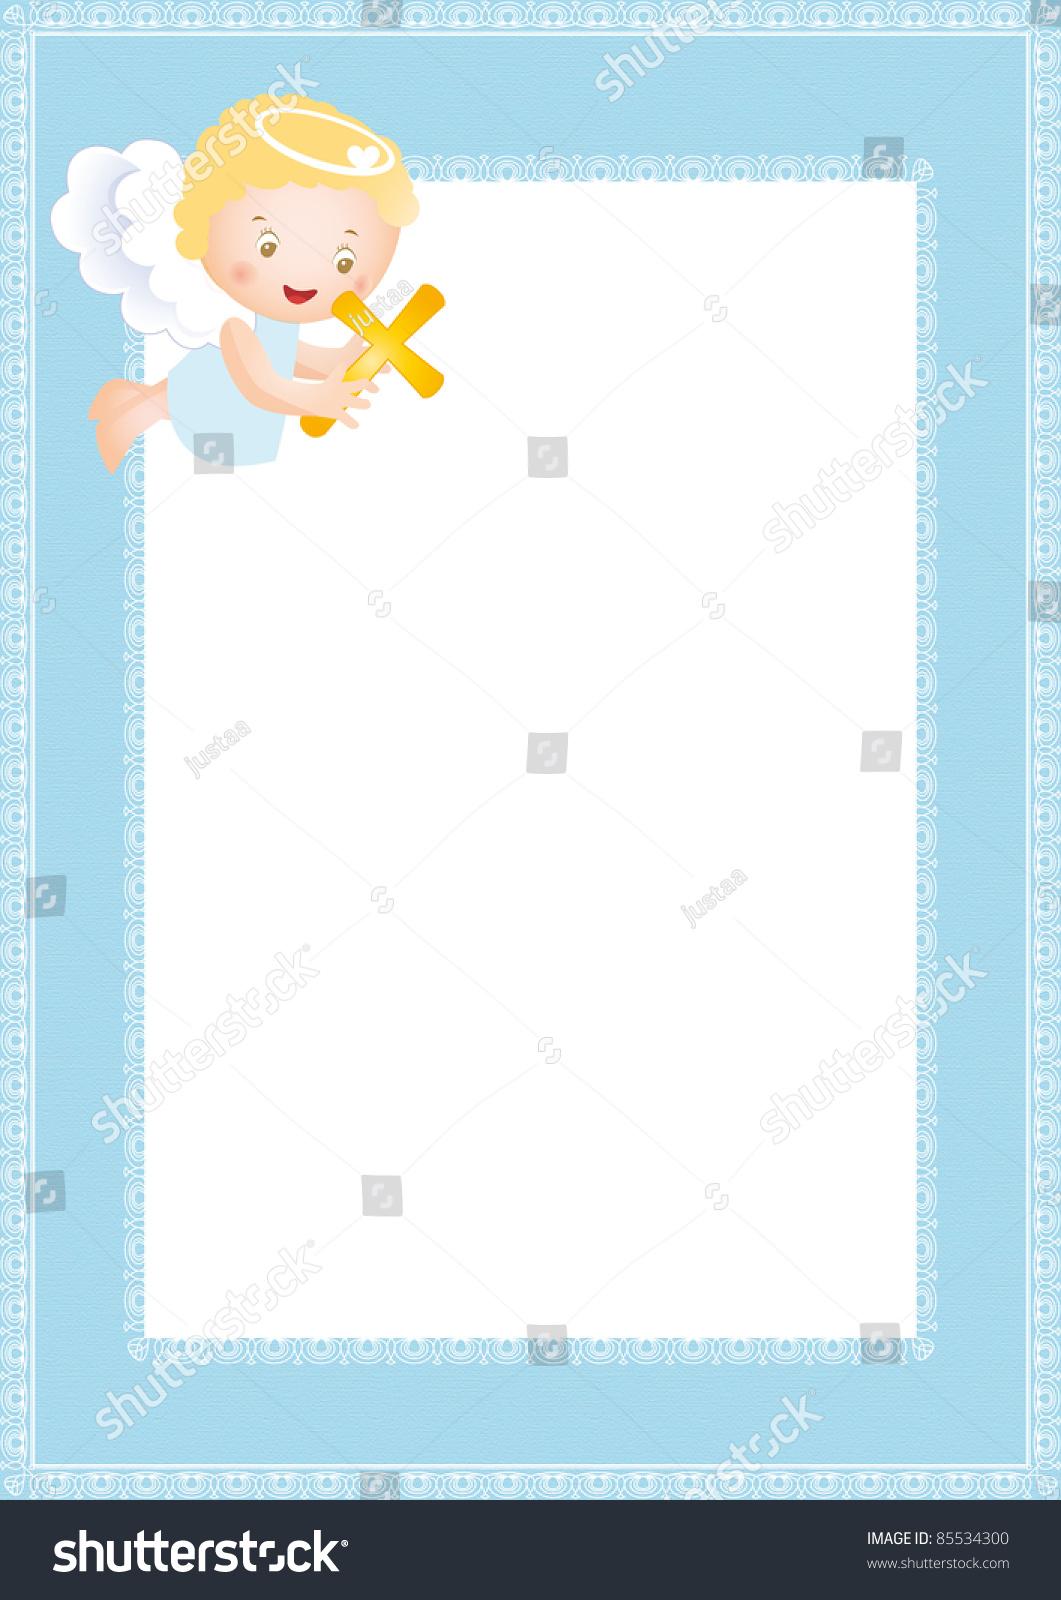 Baby Baptism Frame Small Angel Stock Illustration 85534300 ...